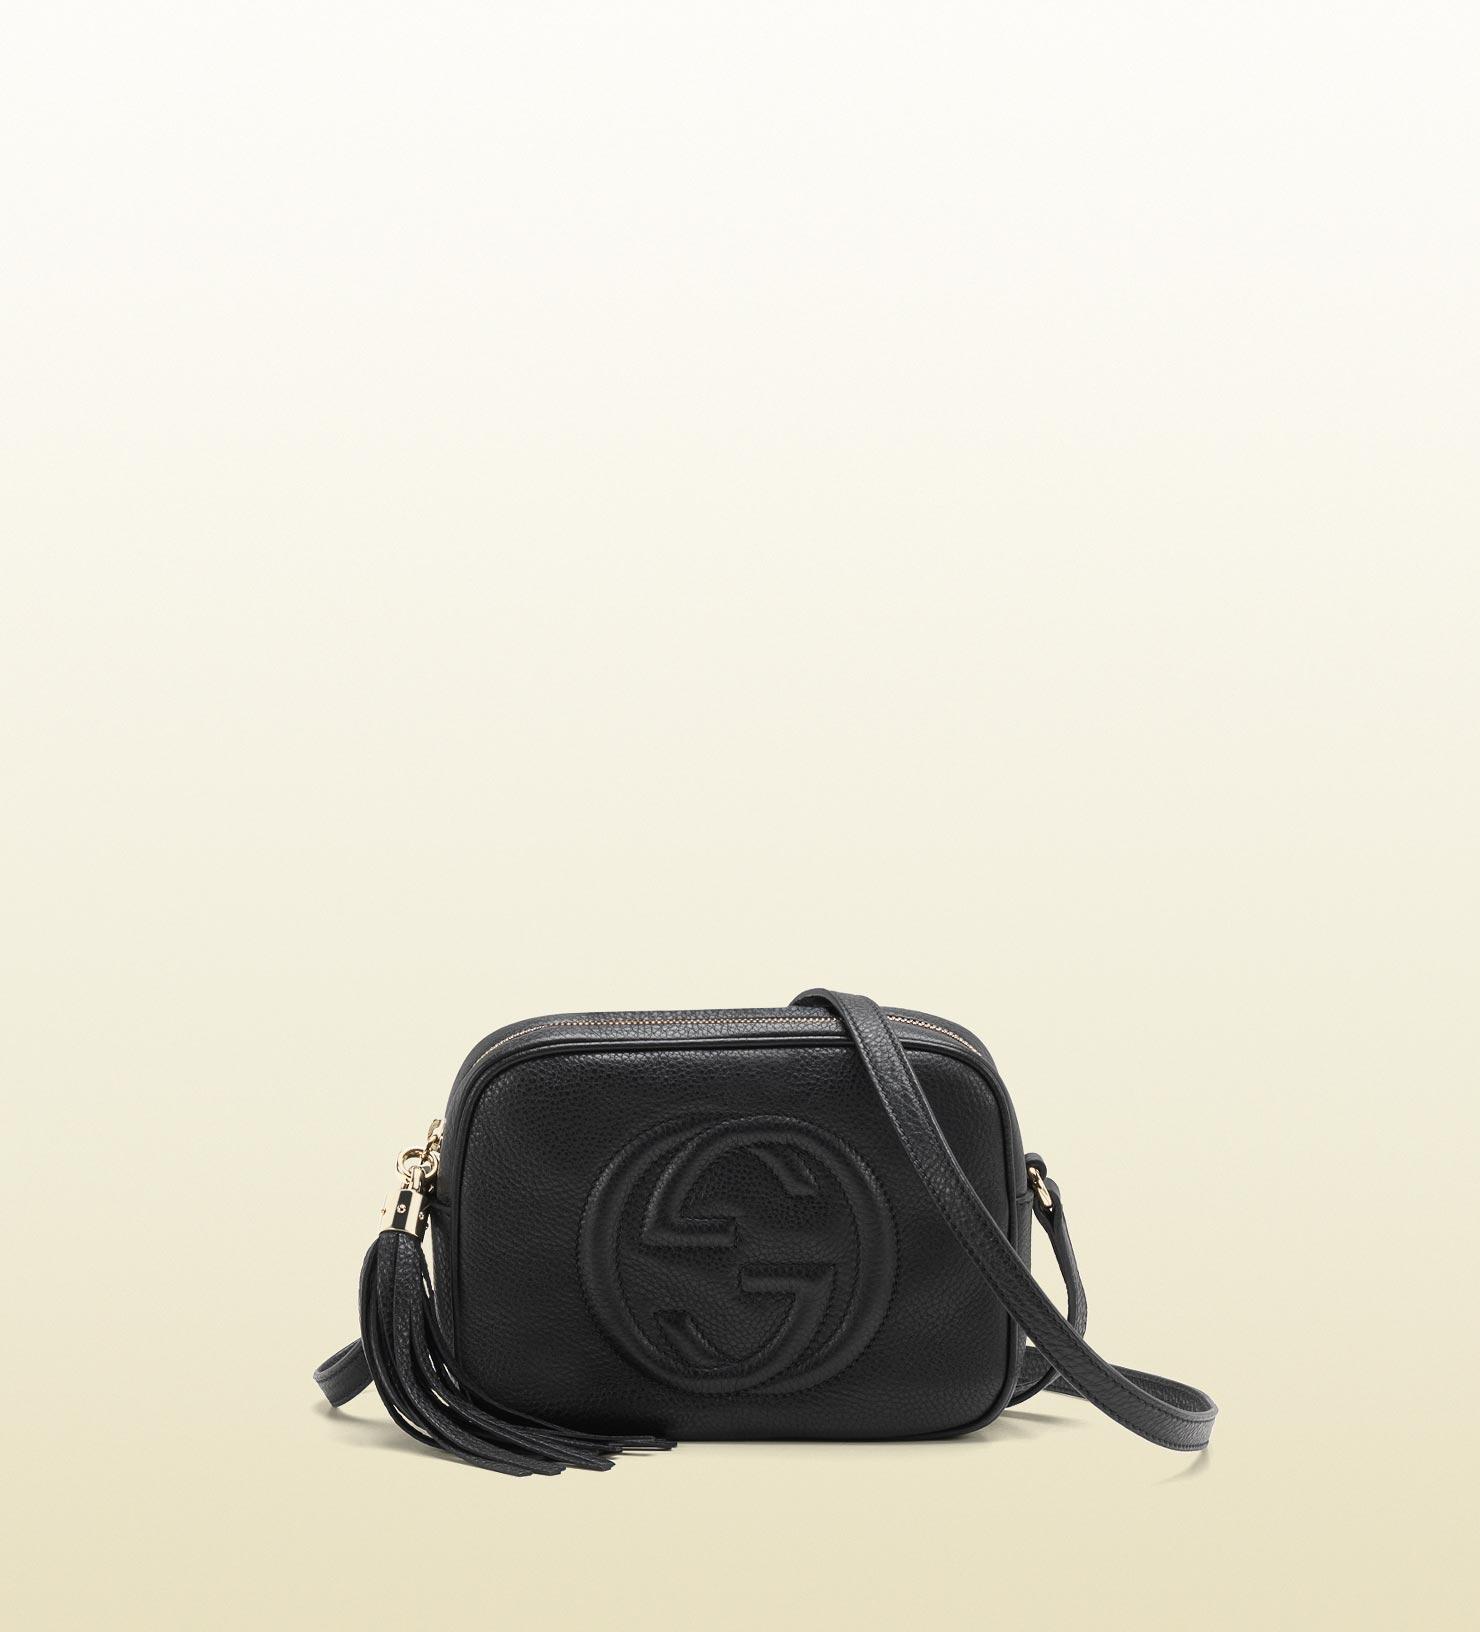 Gucci - disco bag soho 308364A7M0G1000